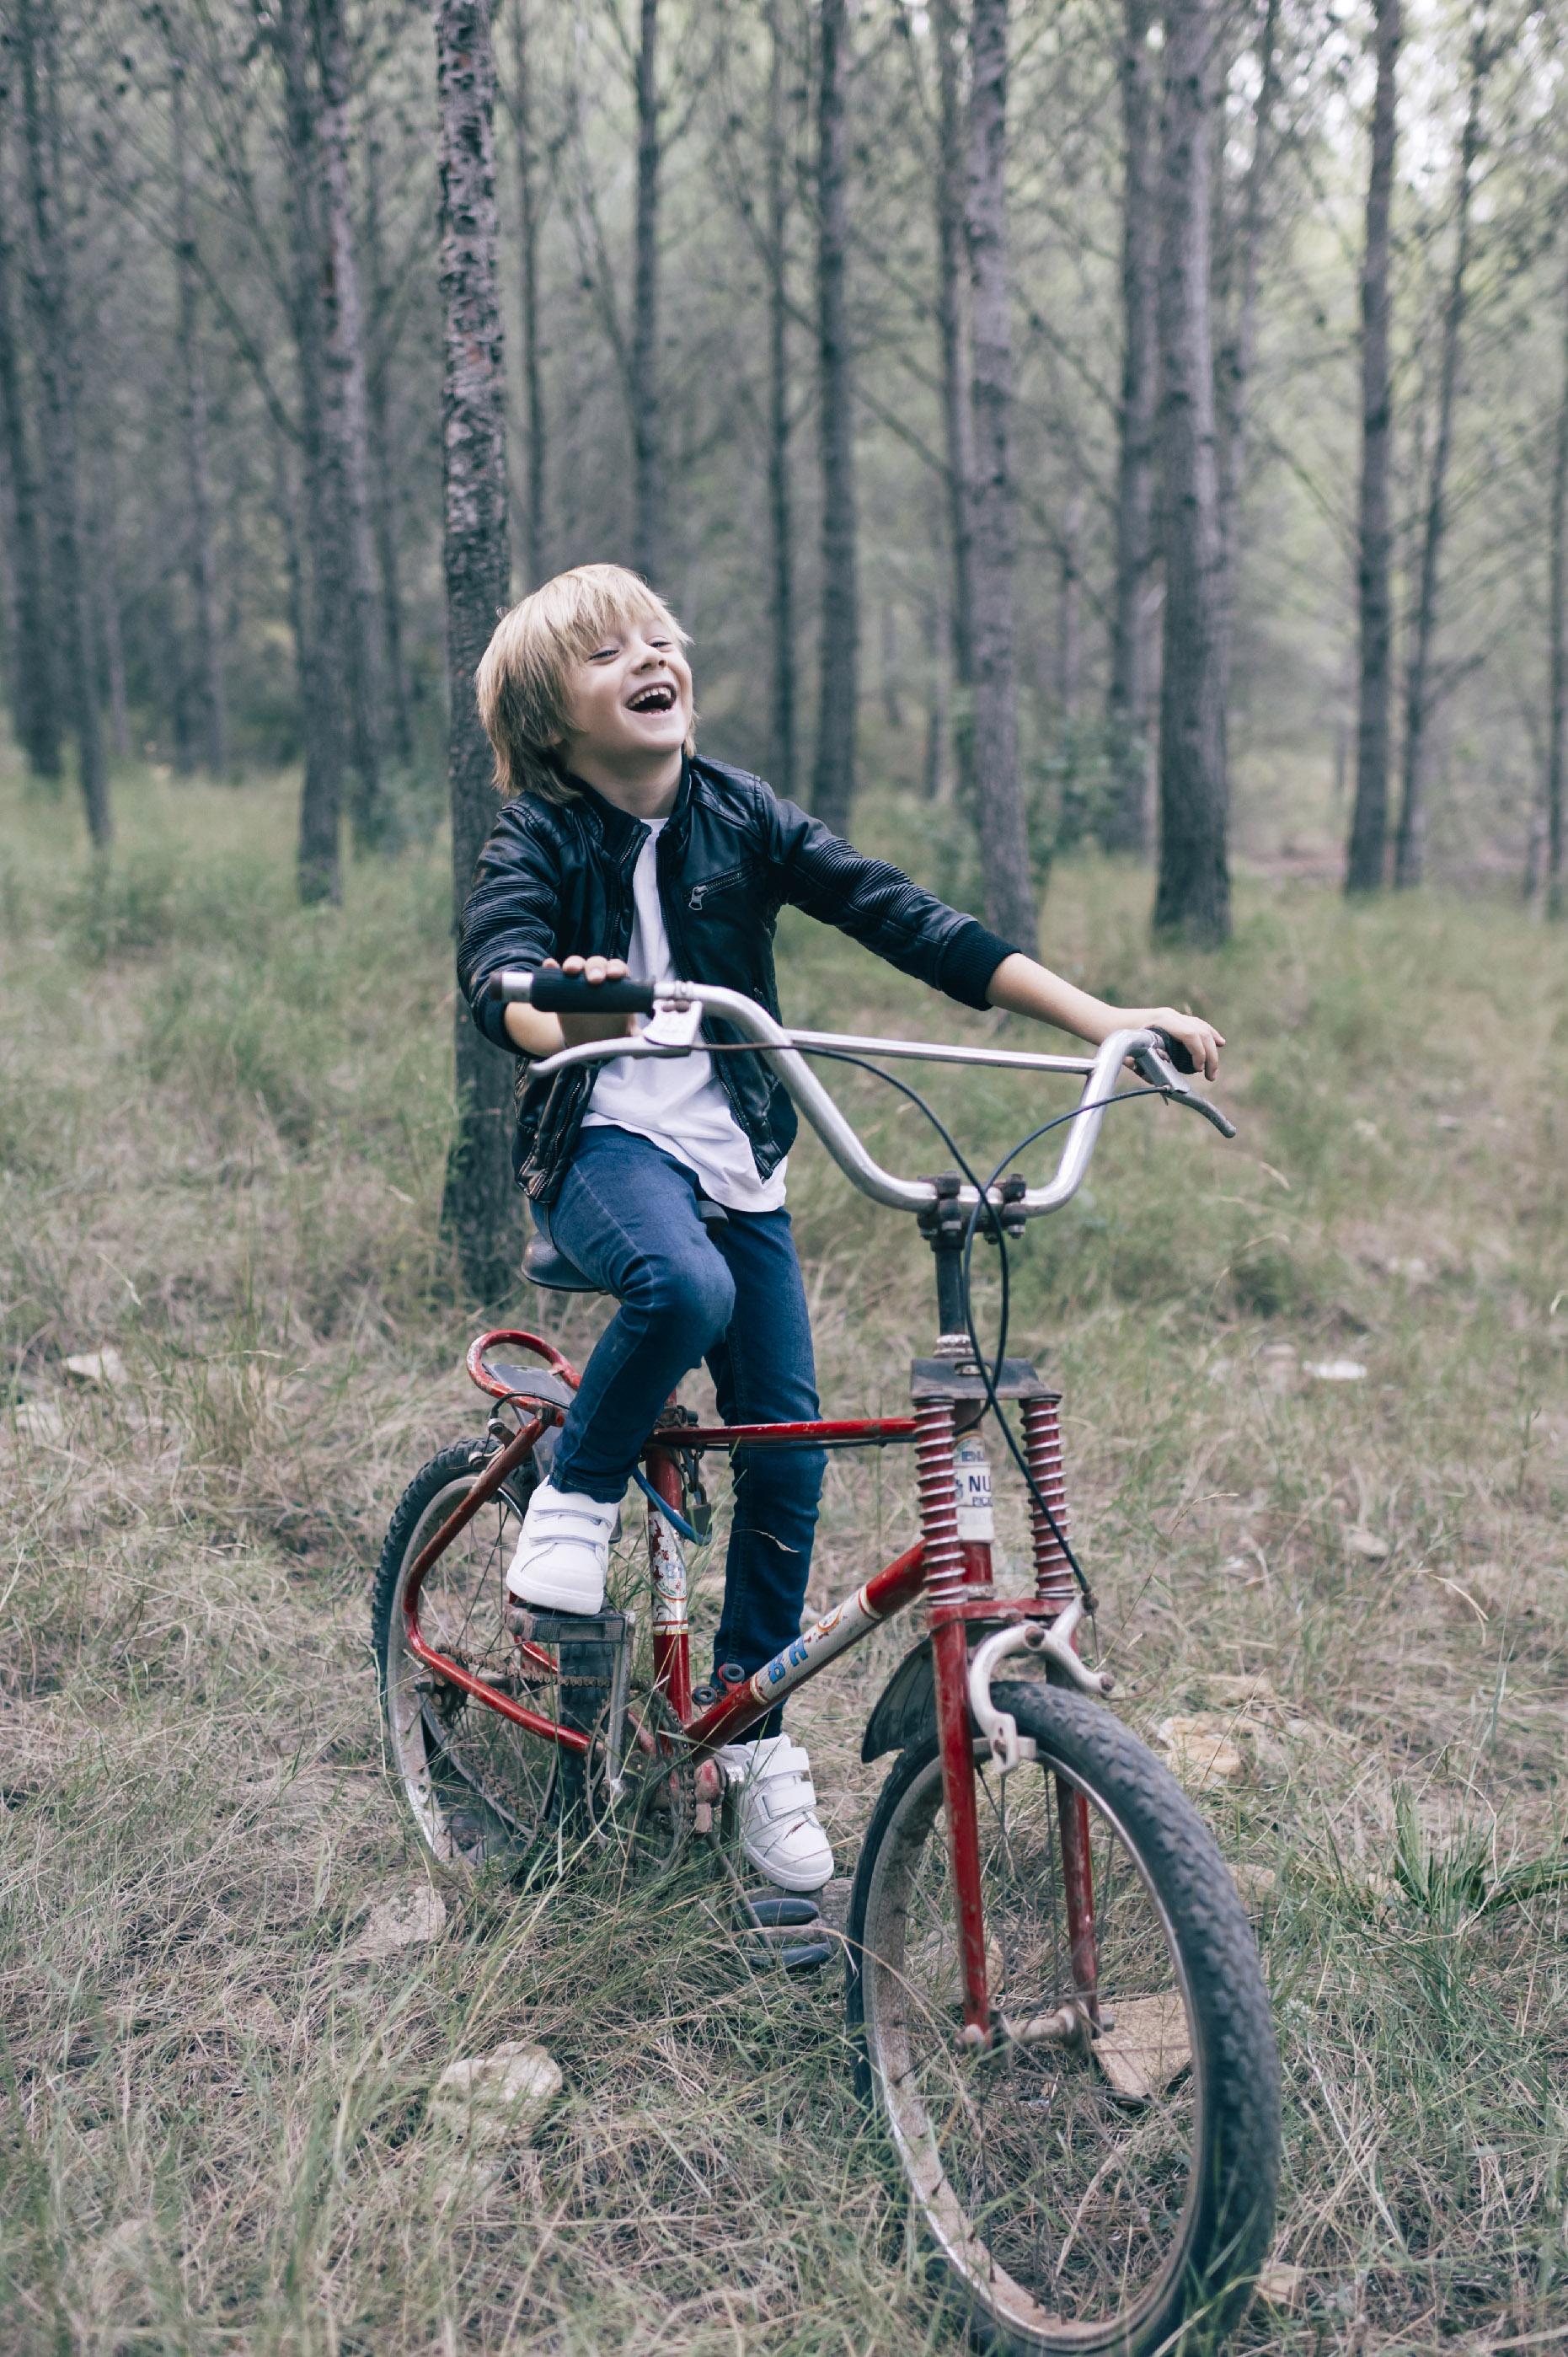 fotografia editorial moda models 8 freestyle bmx  marta mor fotografa castellon_04